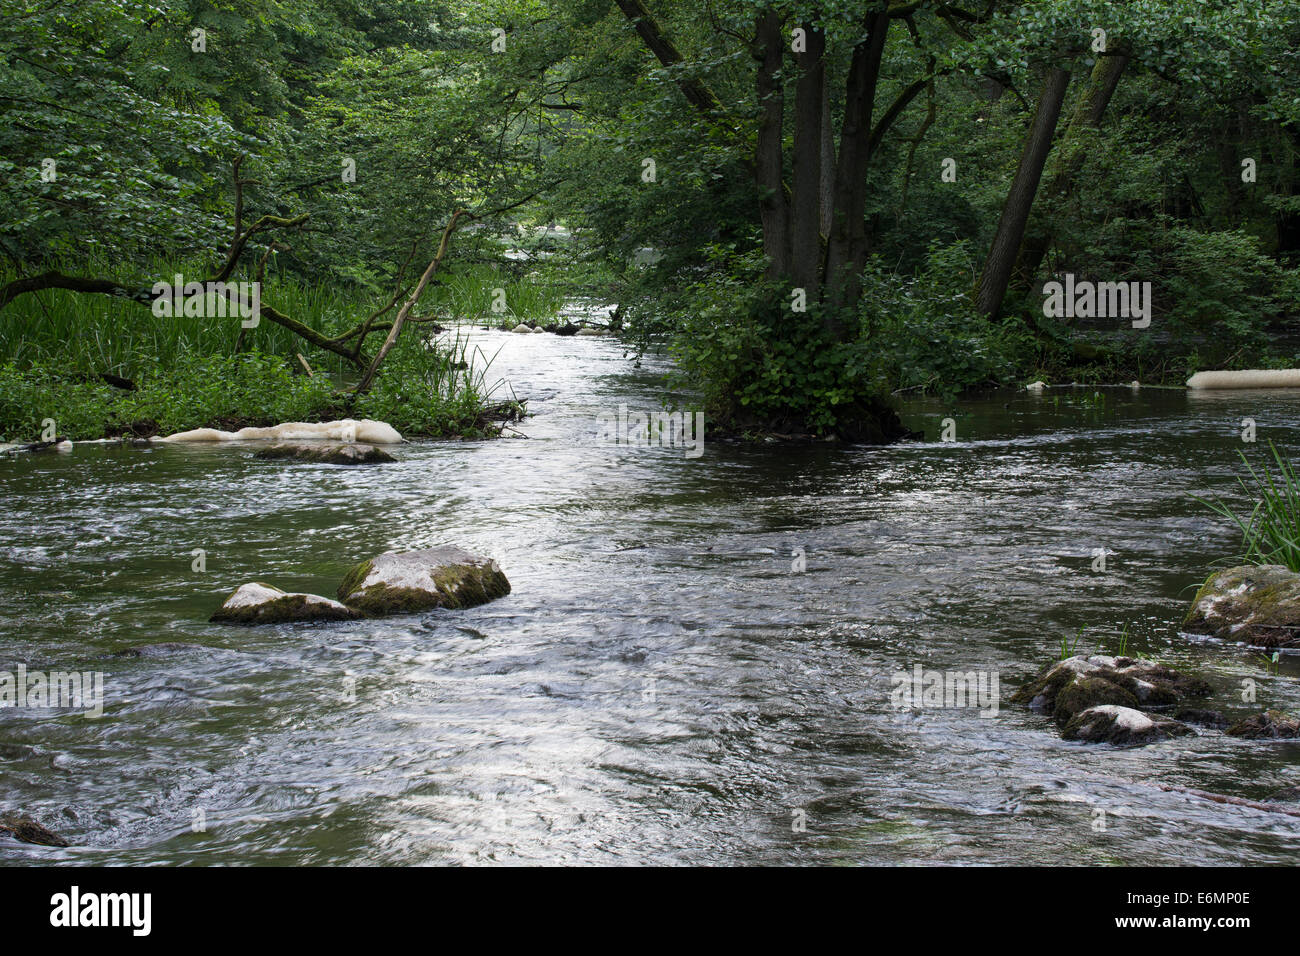 Bach, Bach, Bach, Bach, Tiefland-Bach, Naturnaher Bachlauf, wohl, Fluss, Warnow, Mecklenburg-Vorpommern Stockbild